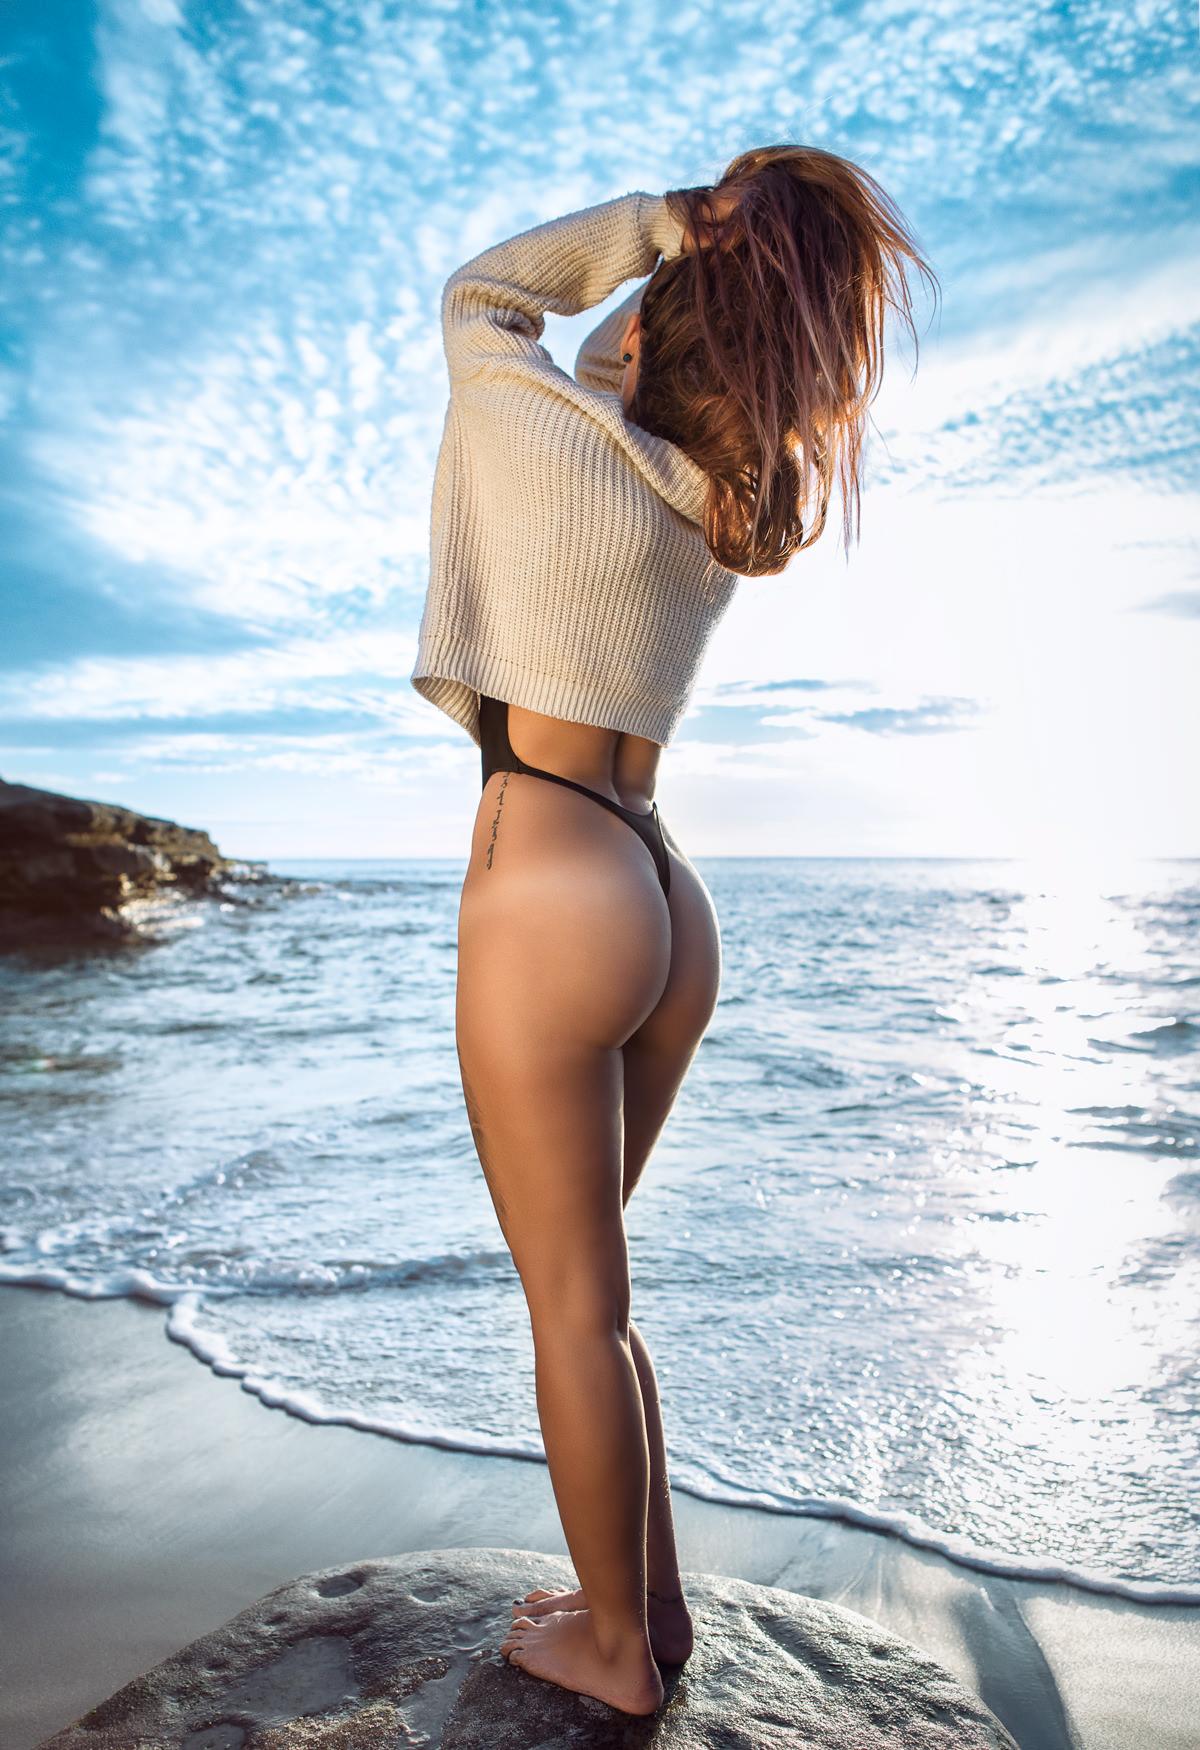 swimwear photographer San Diego